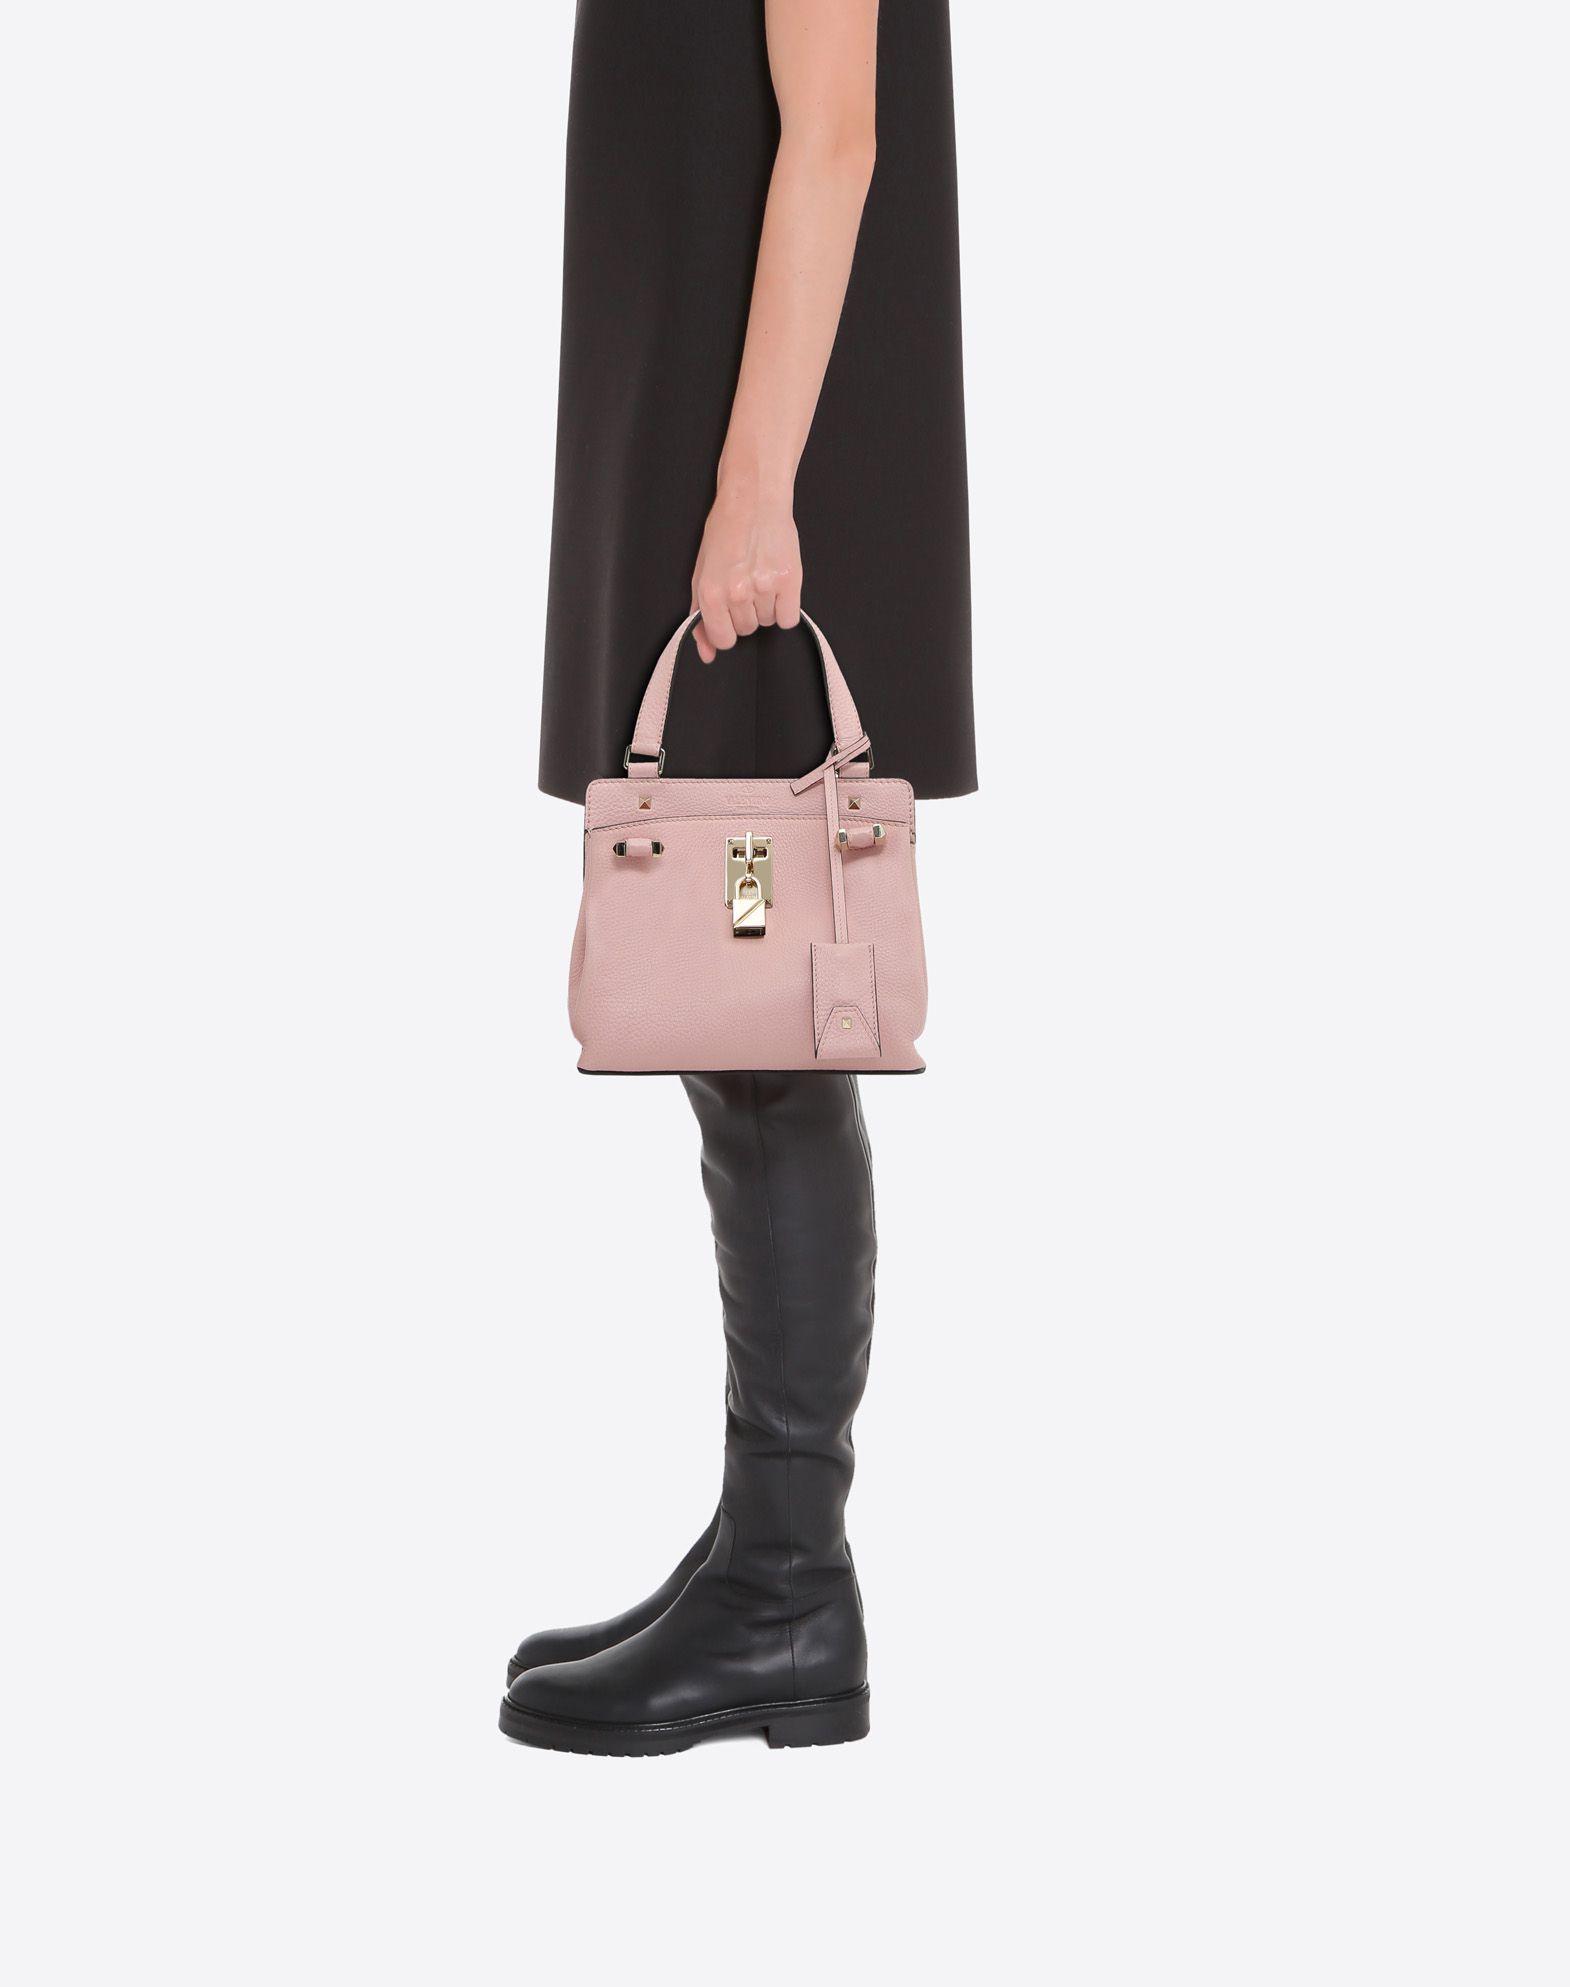 VALENTINO GARAVANI Joylock Small Handle Bag HANDBAG D a